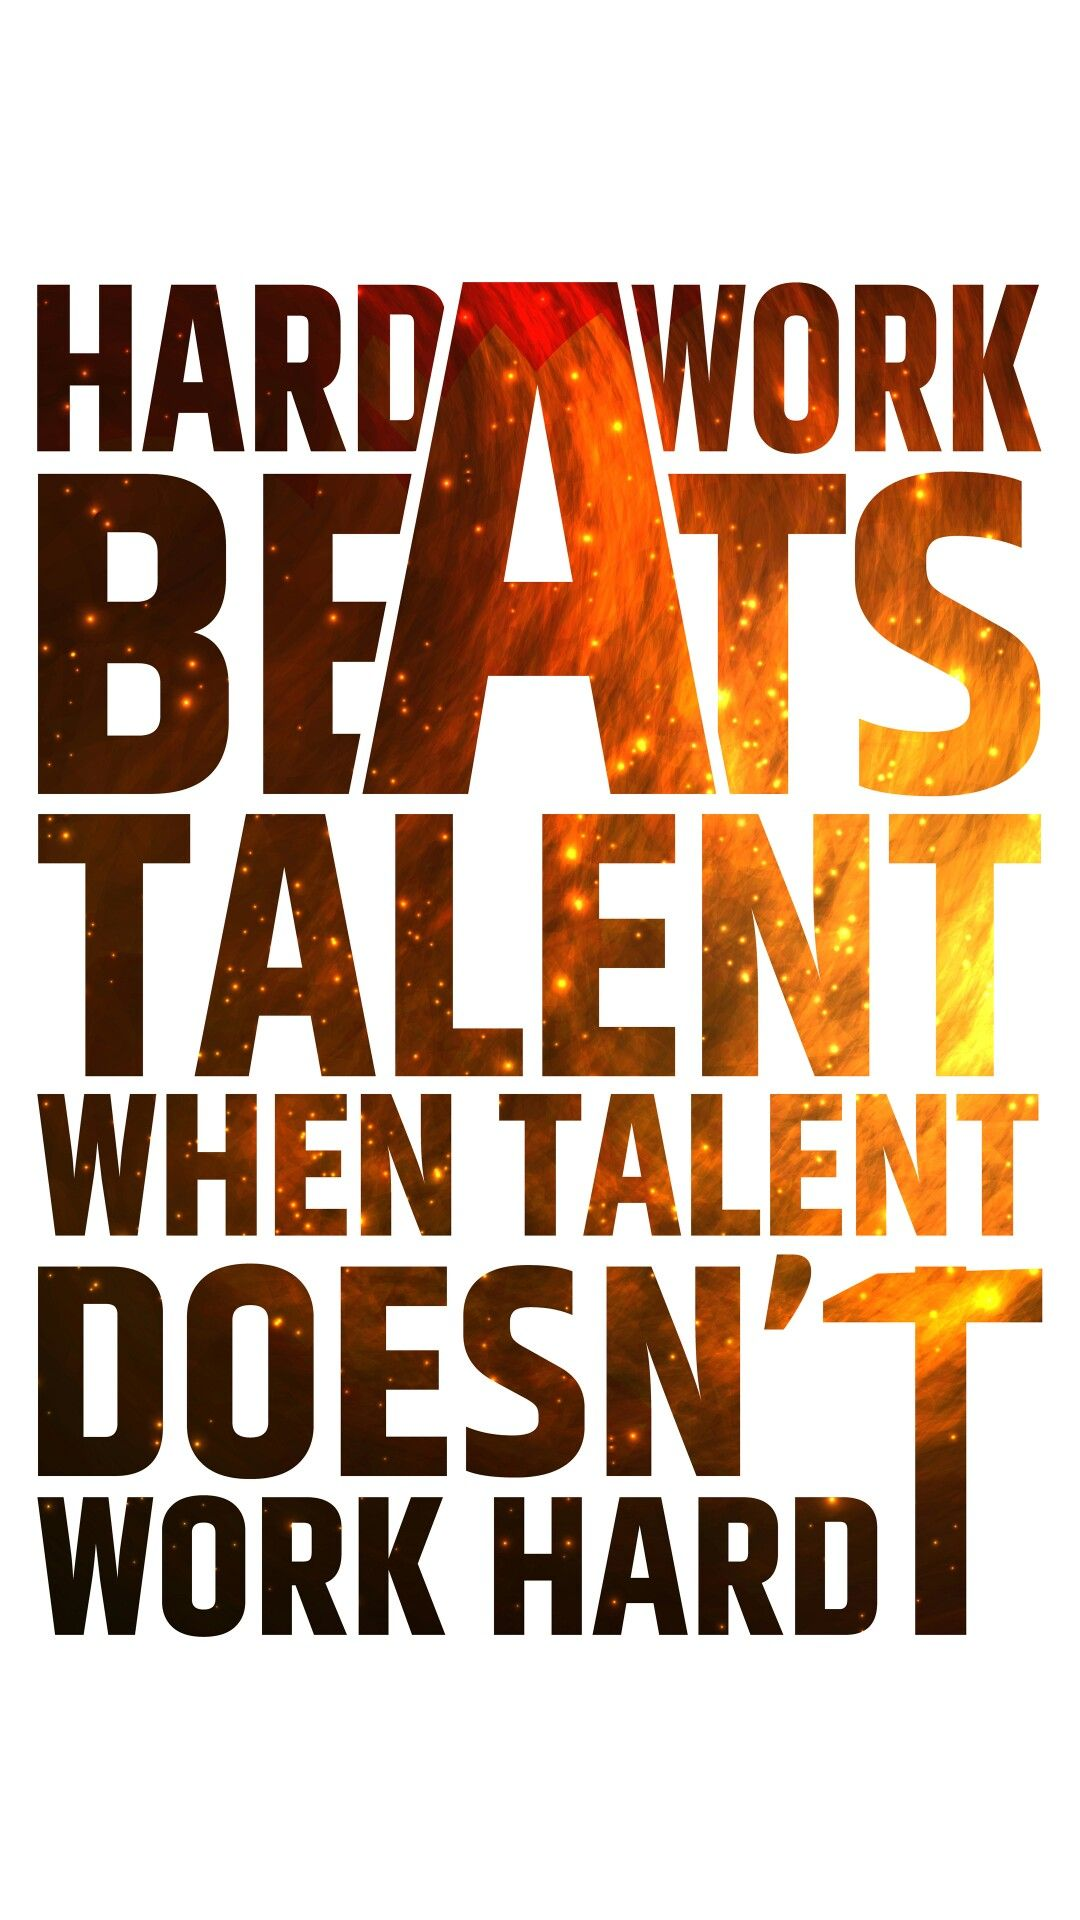 Pin by iNOSknayam on i QuotEs Hard work beats talent